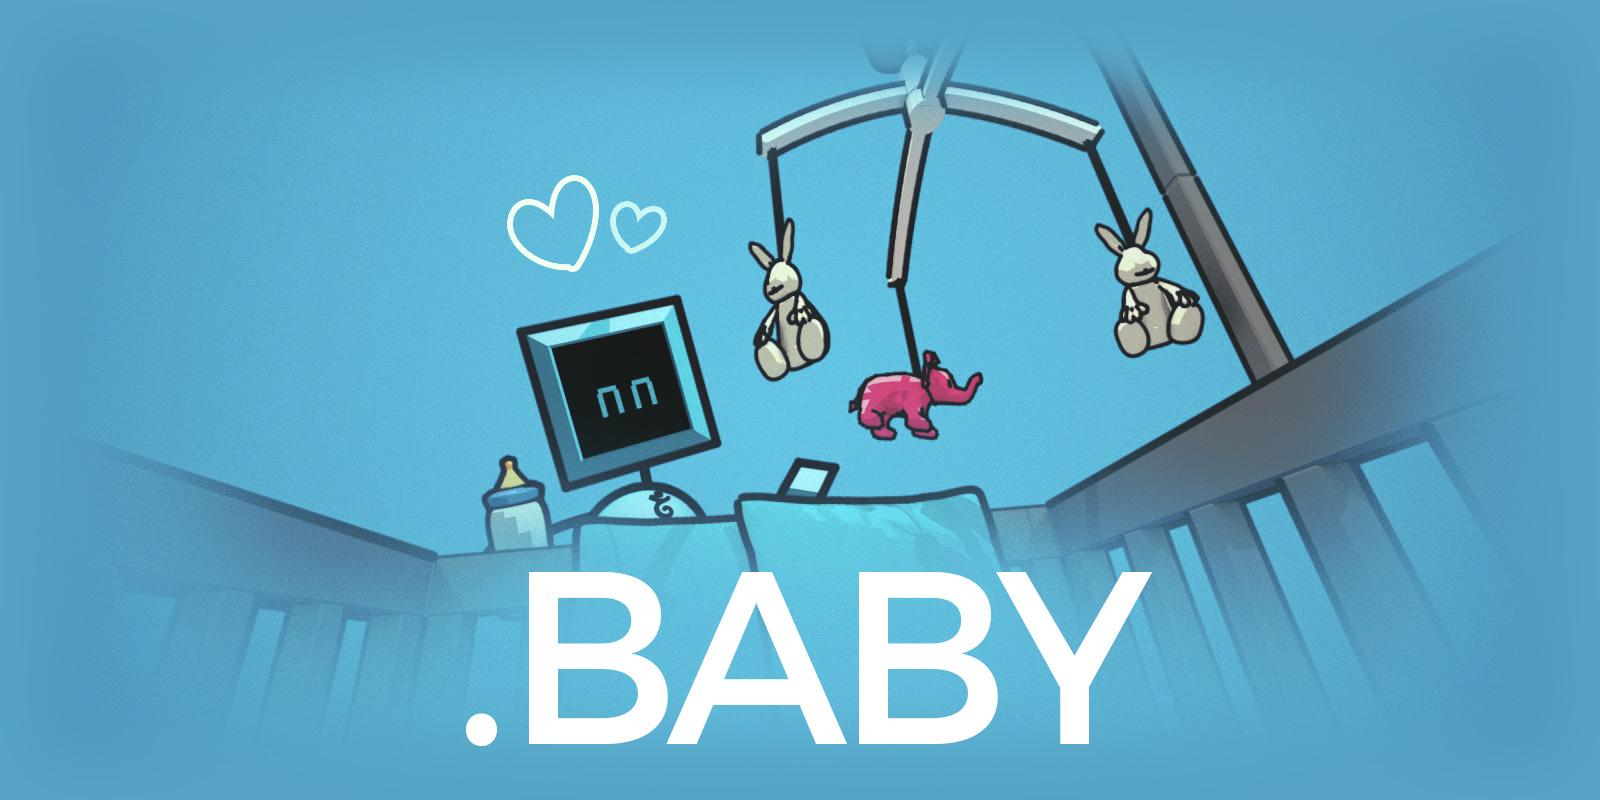 .BABY 在這裡!